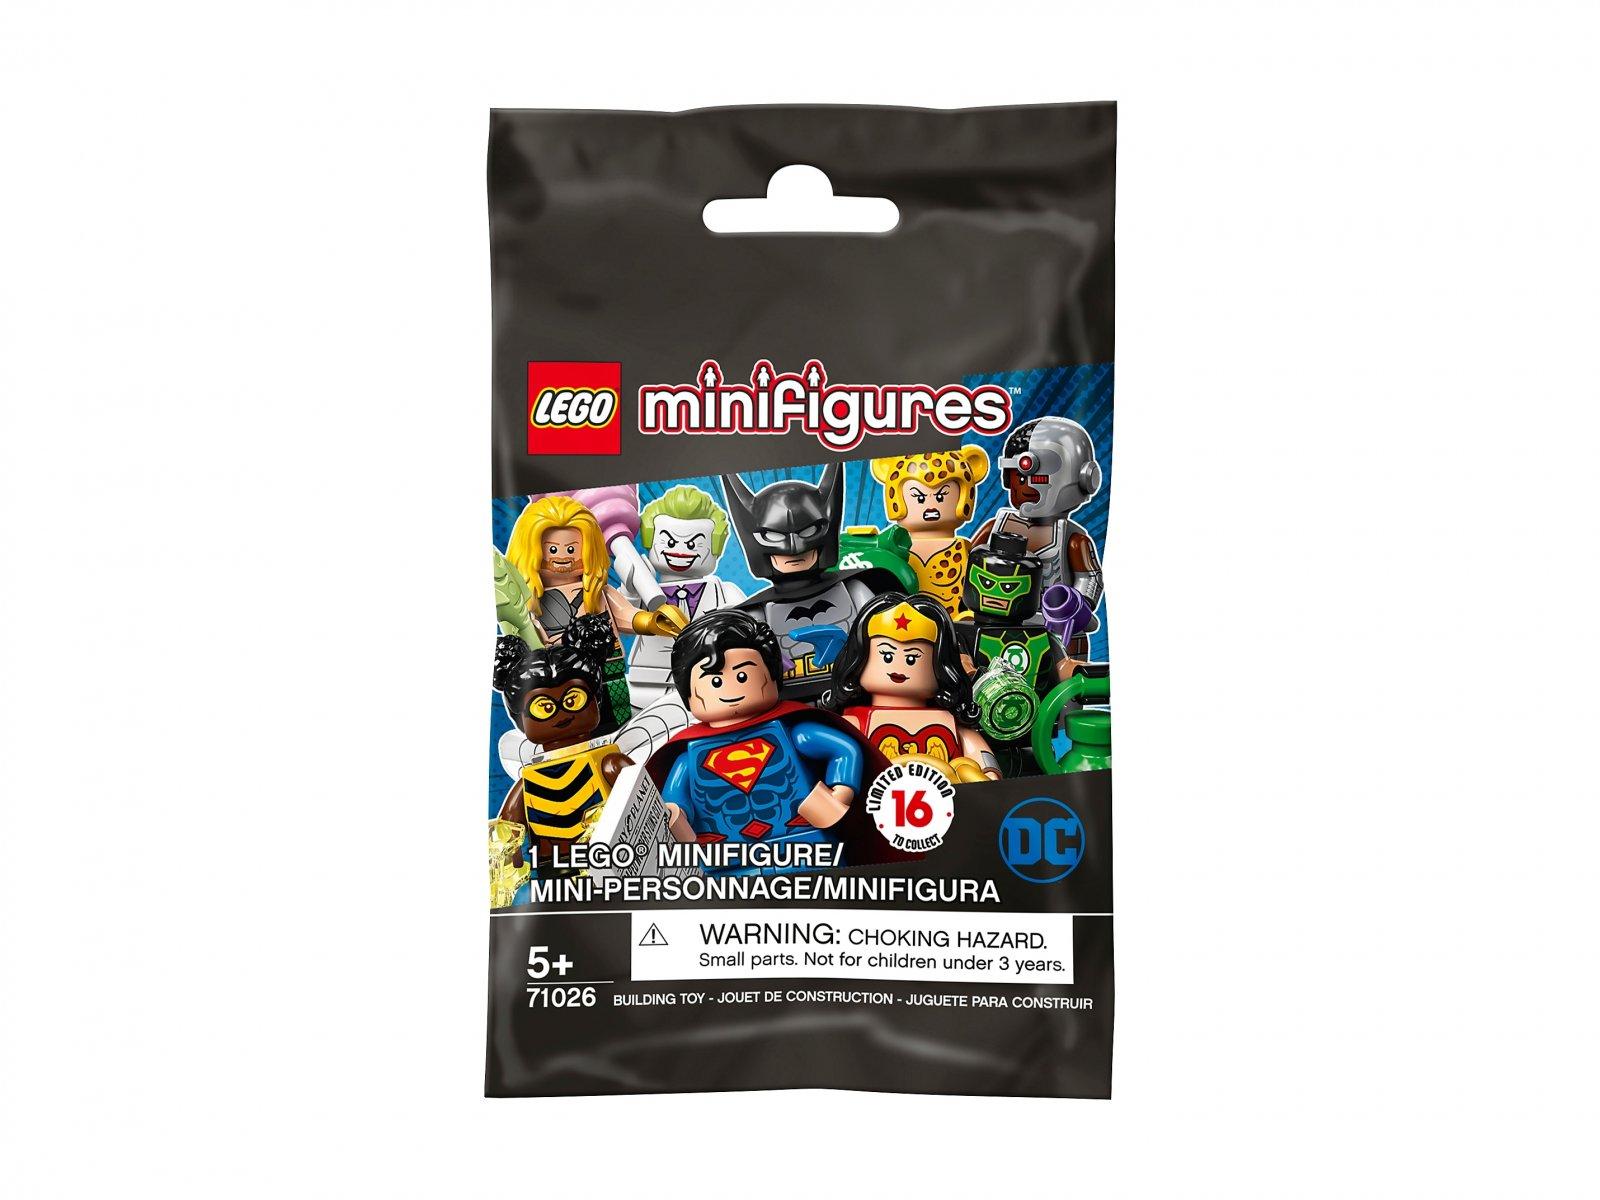 LEGO Minifigures 71026 Seria DC Super Heroes